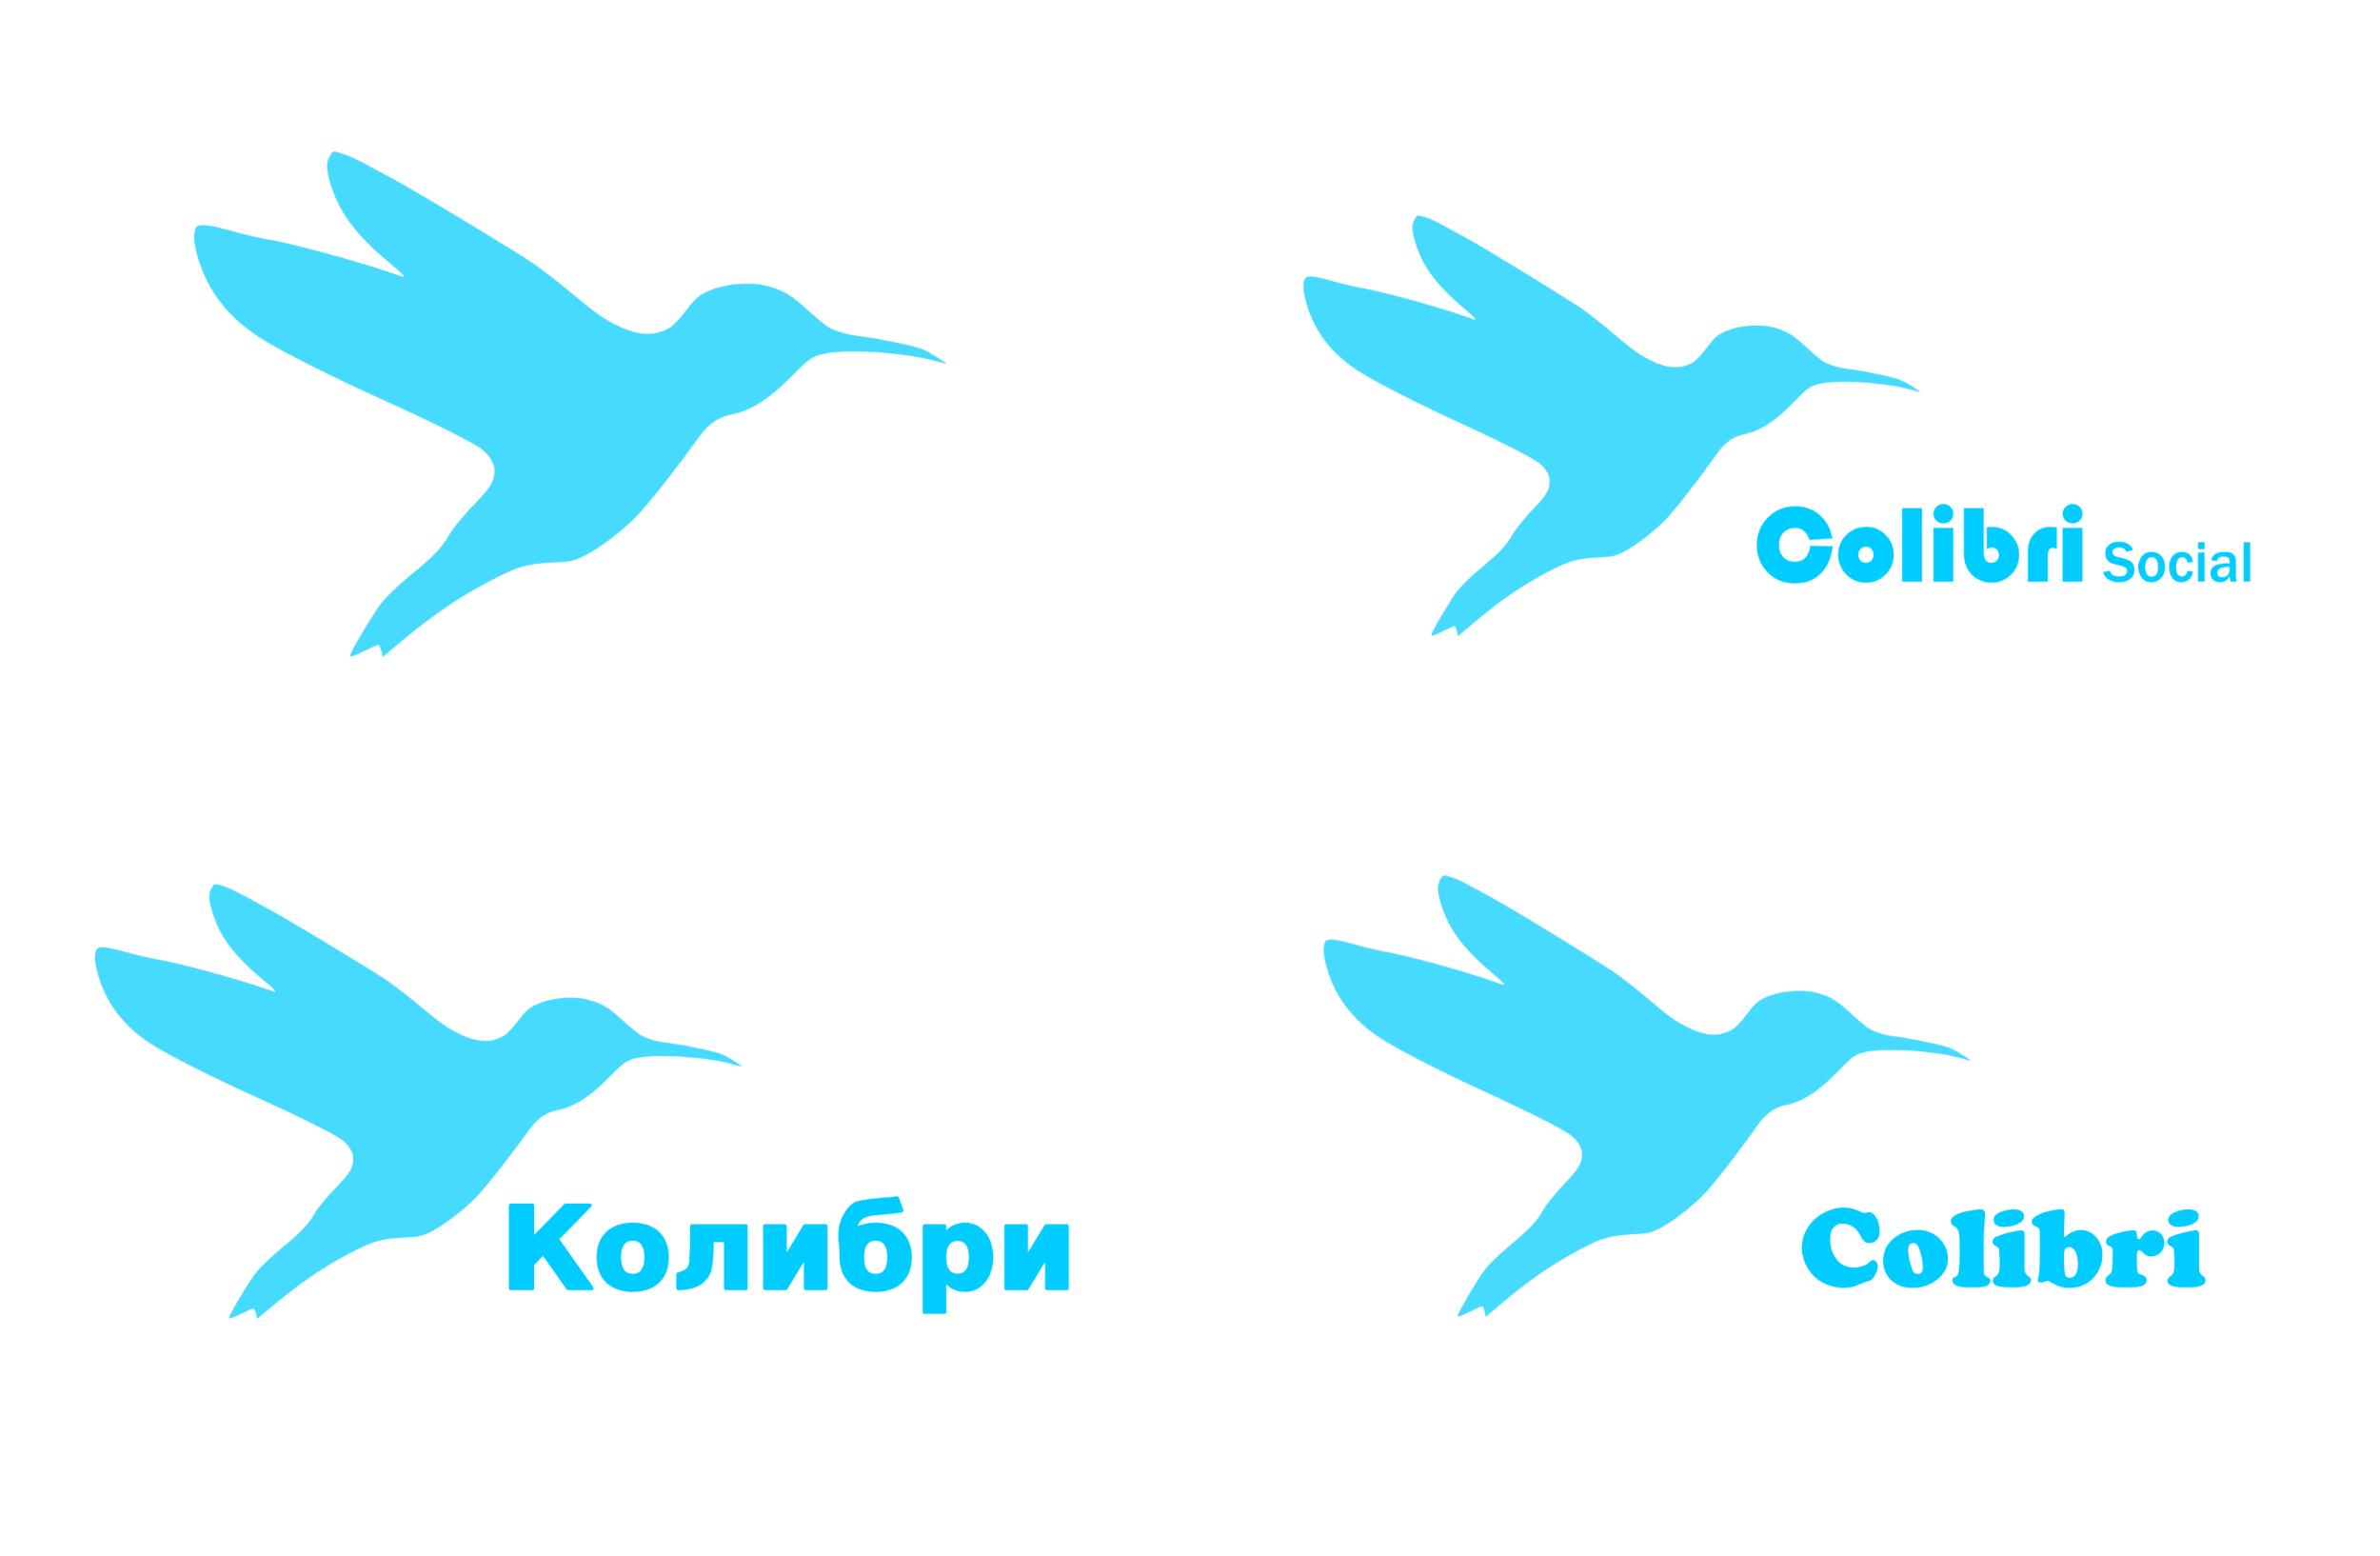 Дизайнер, разработка логотипа компании фото f_614557fdf477373d.png